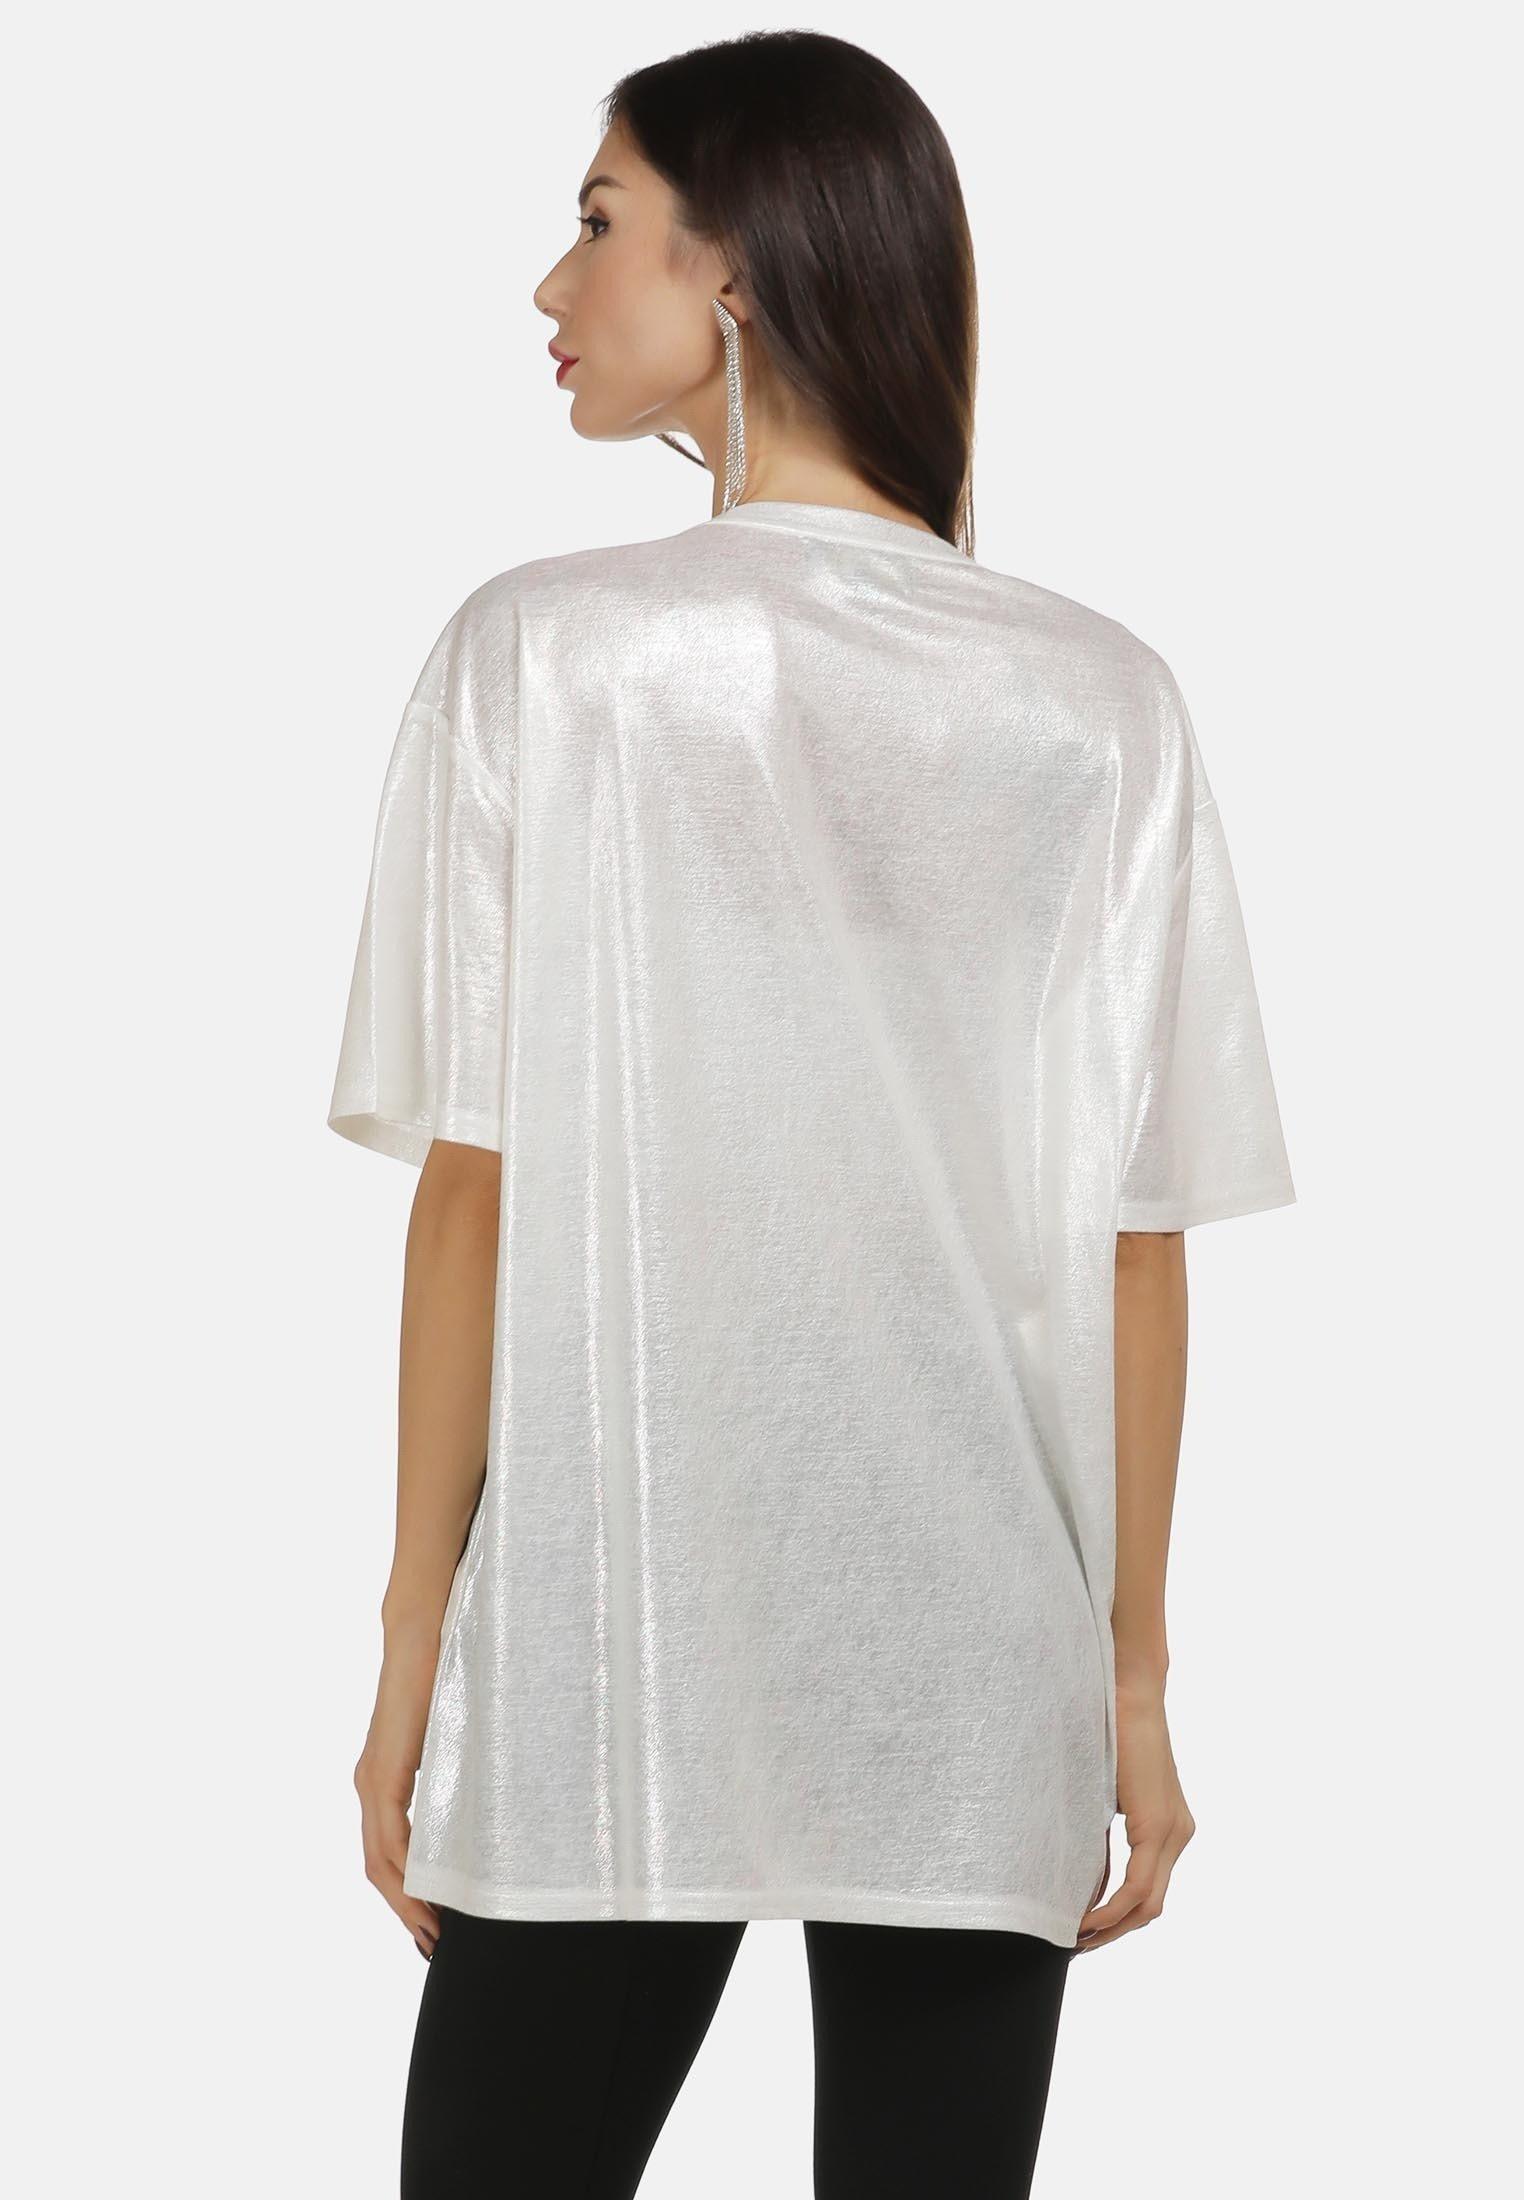 Low Cost Women's Clothing faina Blouse weiss glitzer ua9QzEoXL